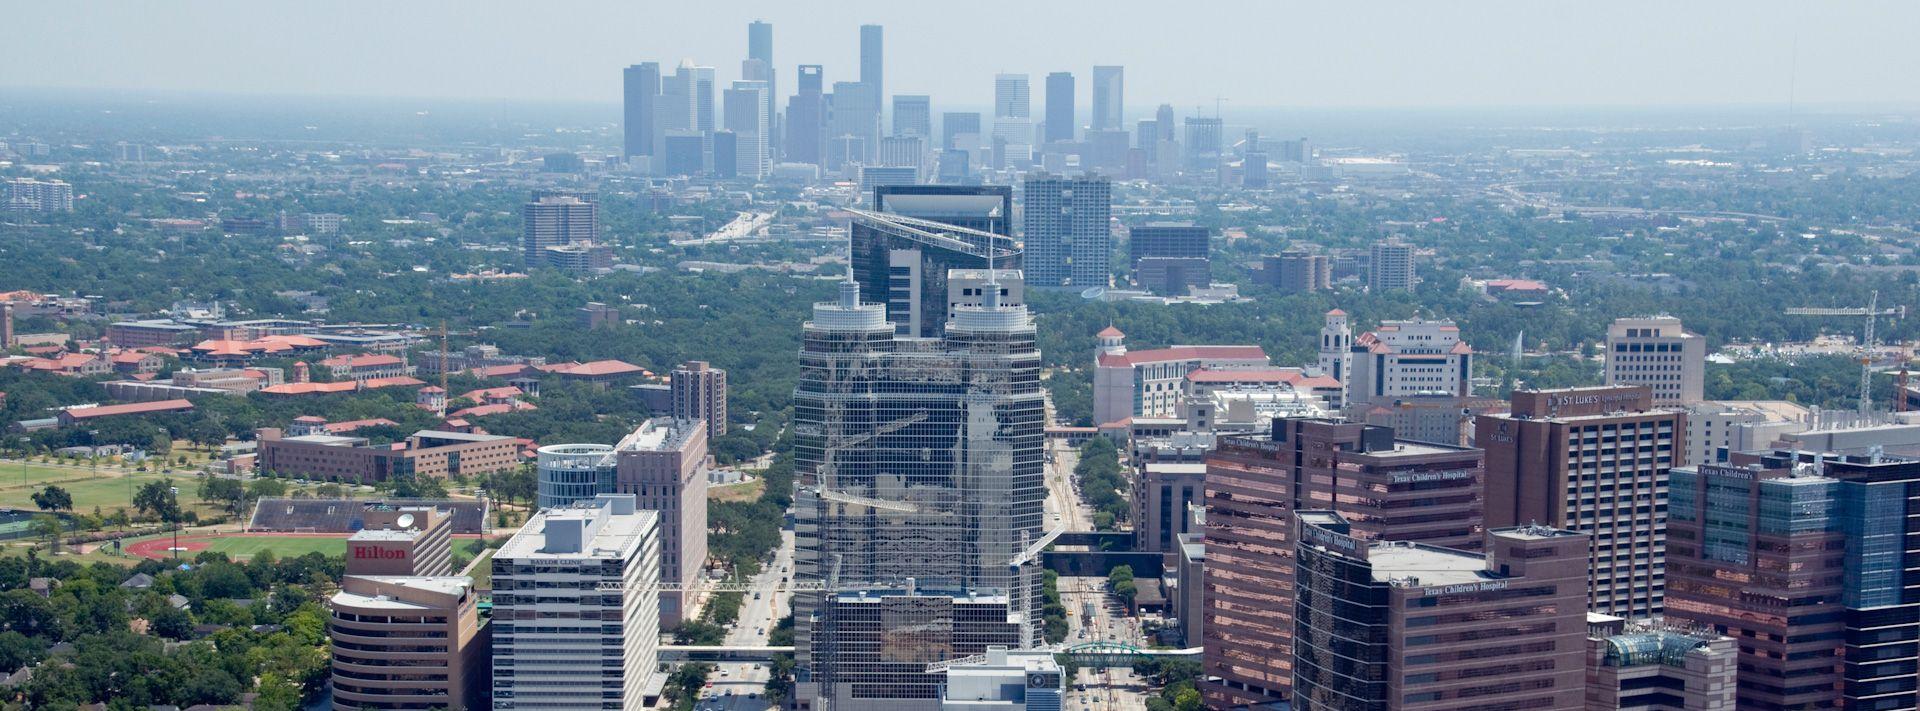 Health Care Council | Houston.org